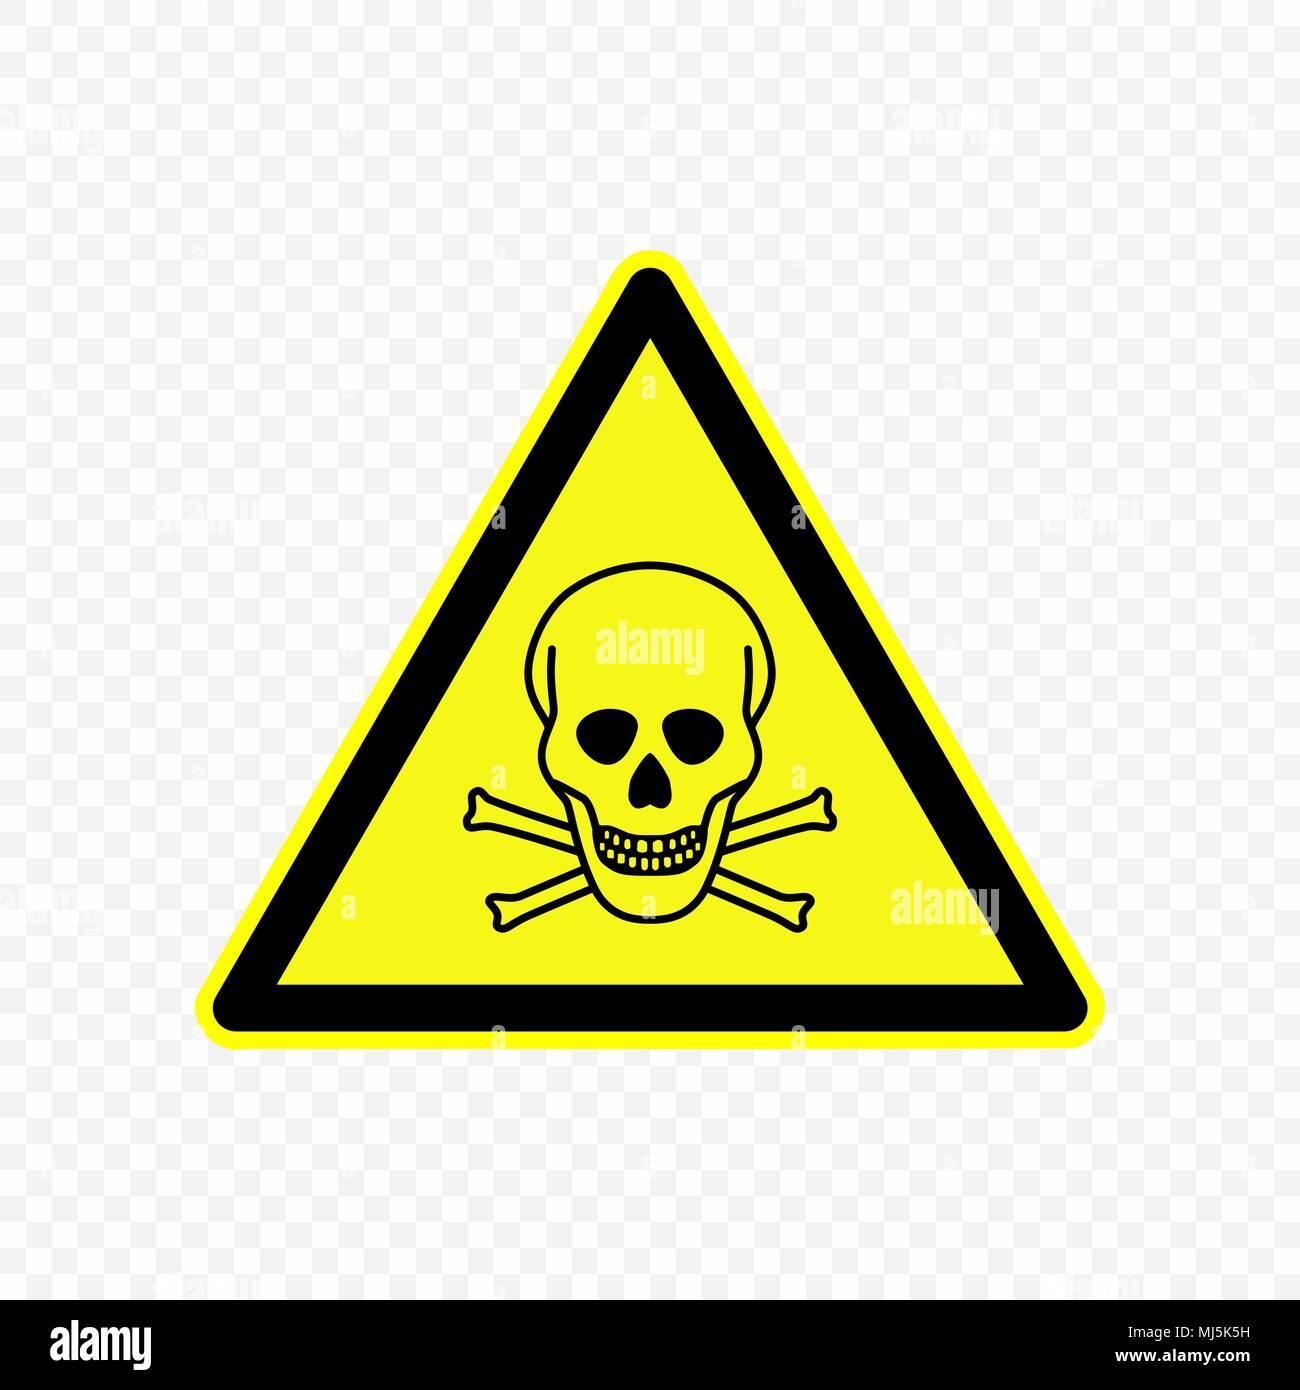 Toxic Warning Sign Hazard Symbols Stock Vector Art Illustration